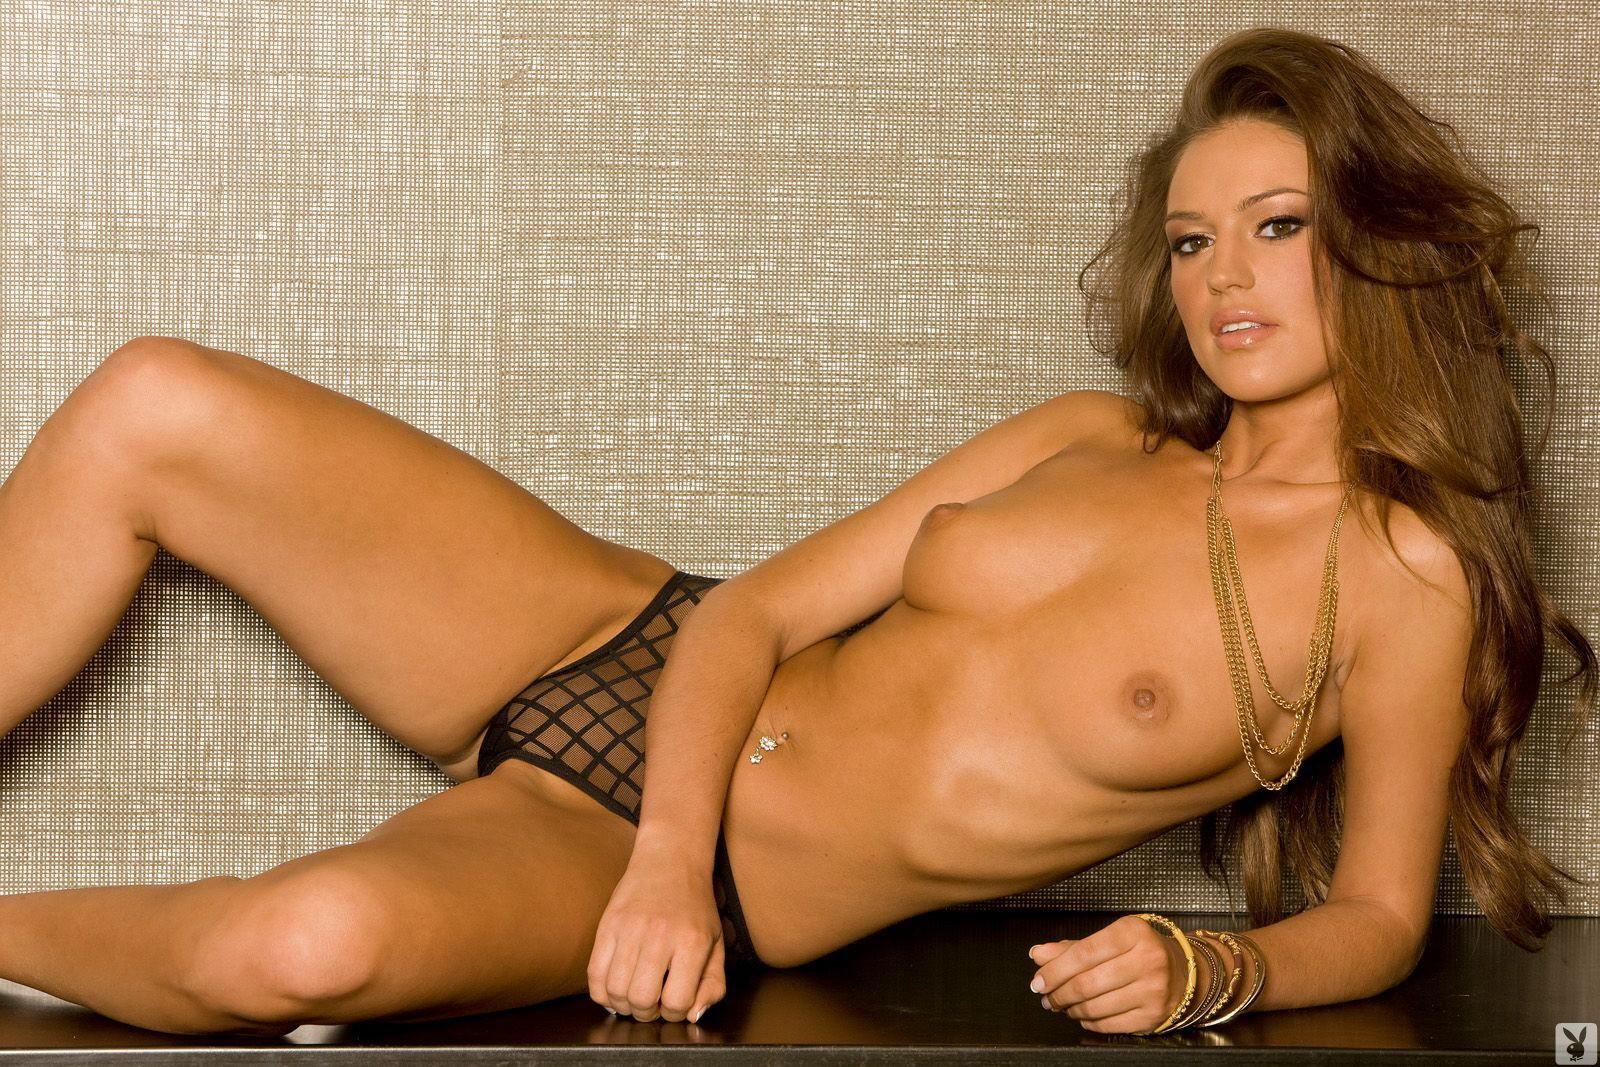 Charlie Riina Desnuda Página 5 Fotos Desnuda Descuido Topless